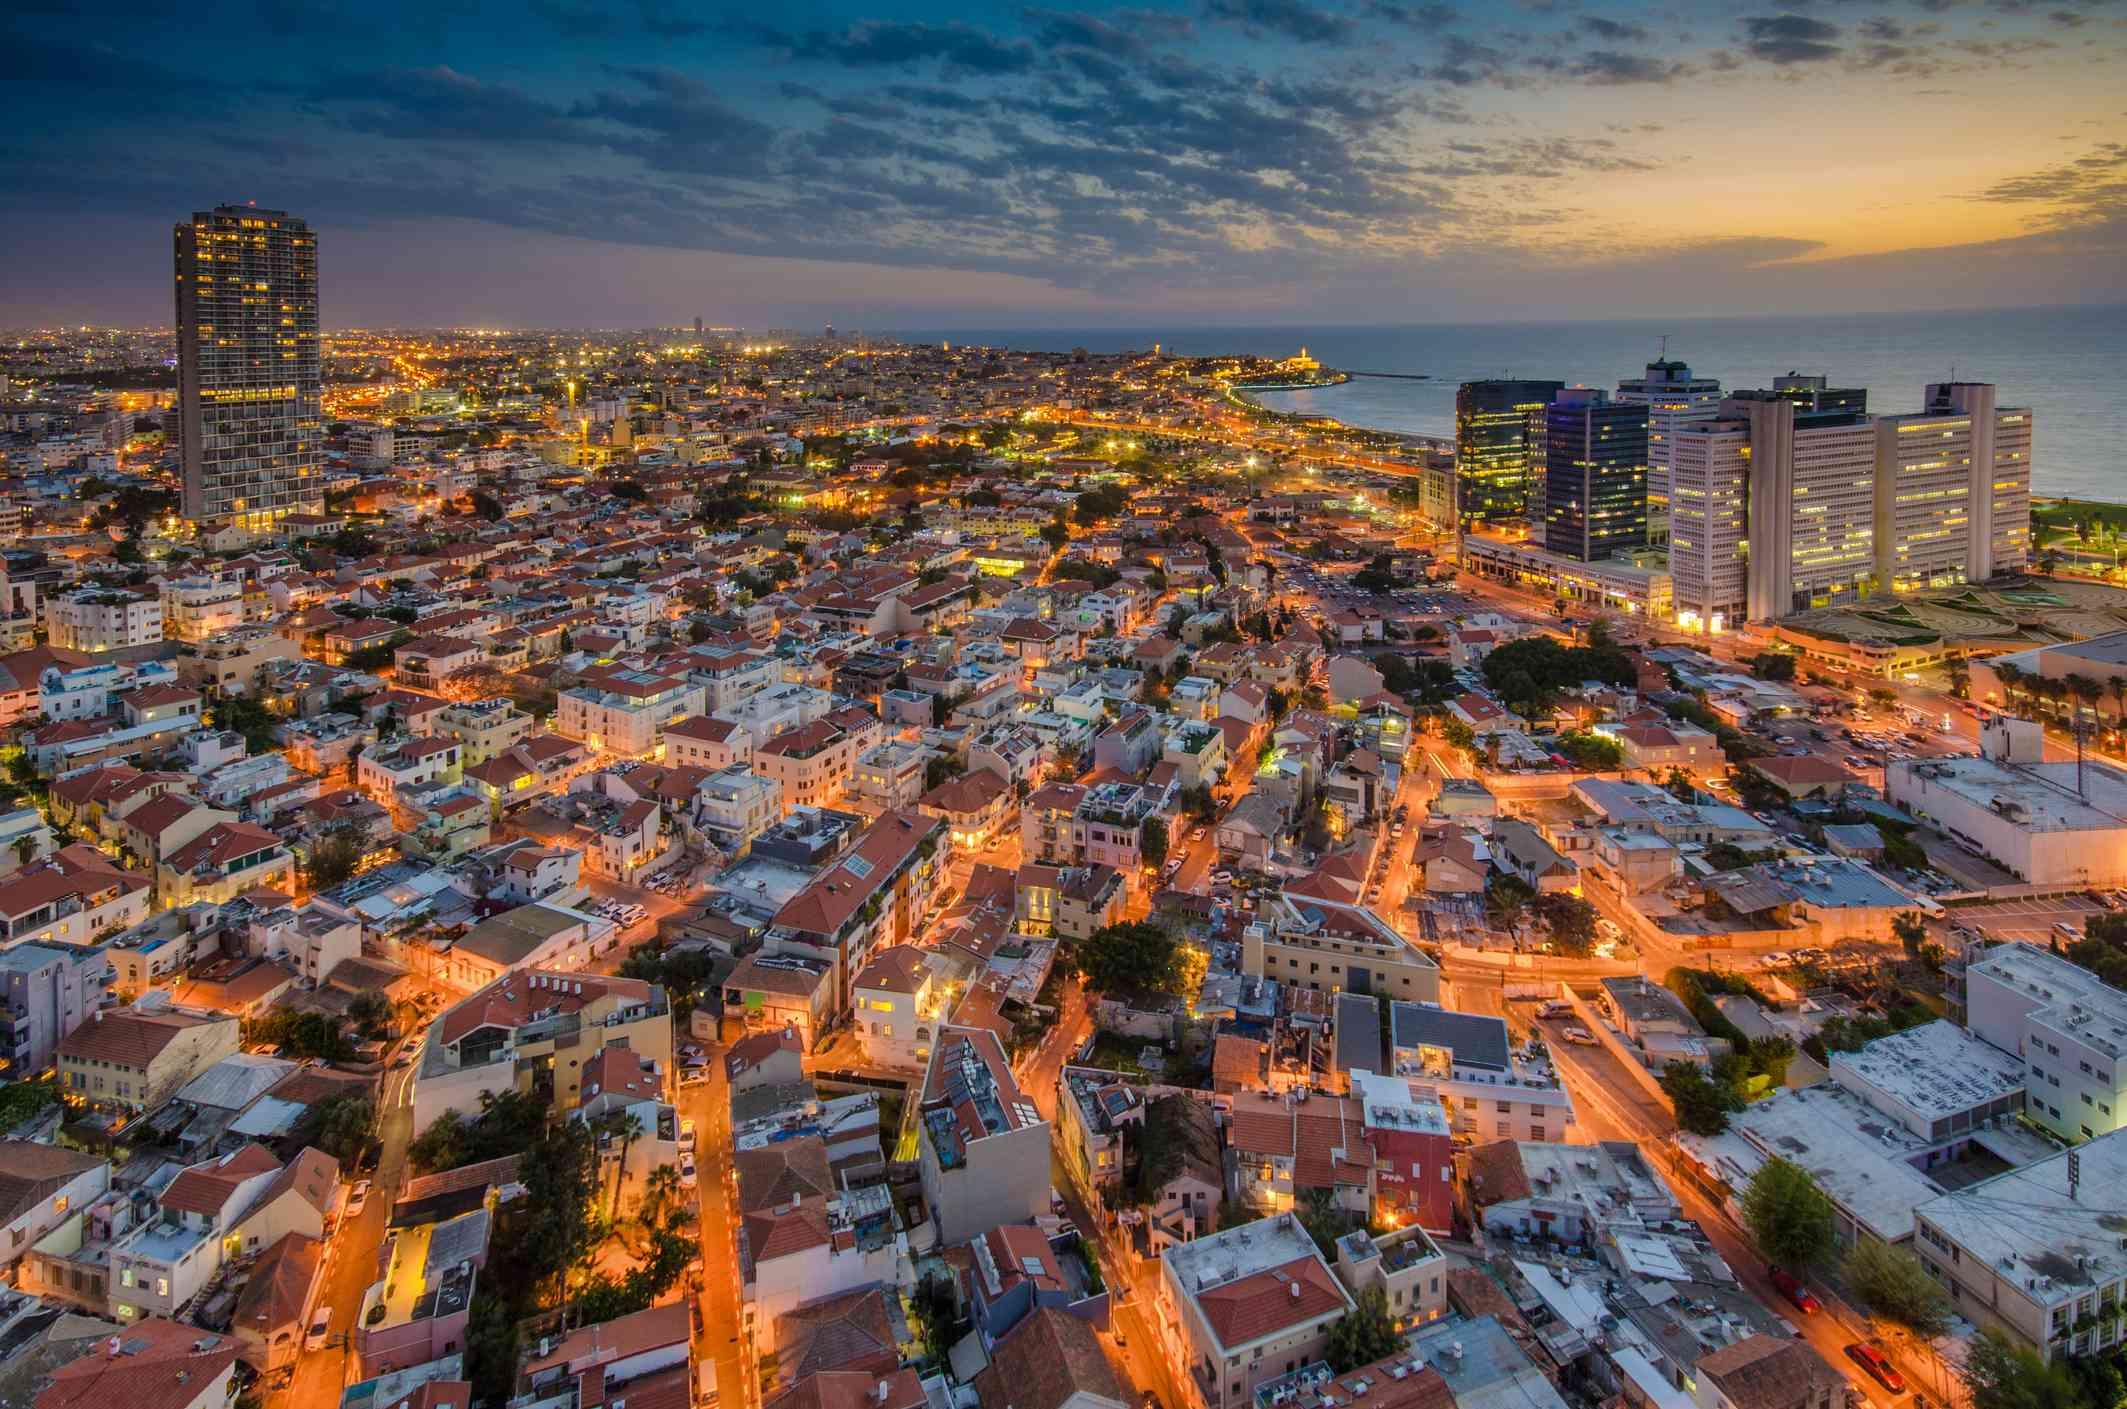 Tel Aviv and Jaffa, Israel